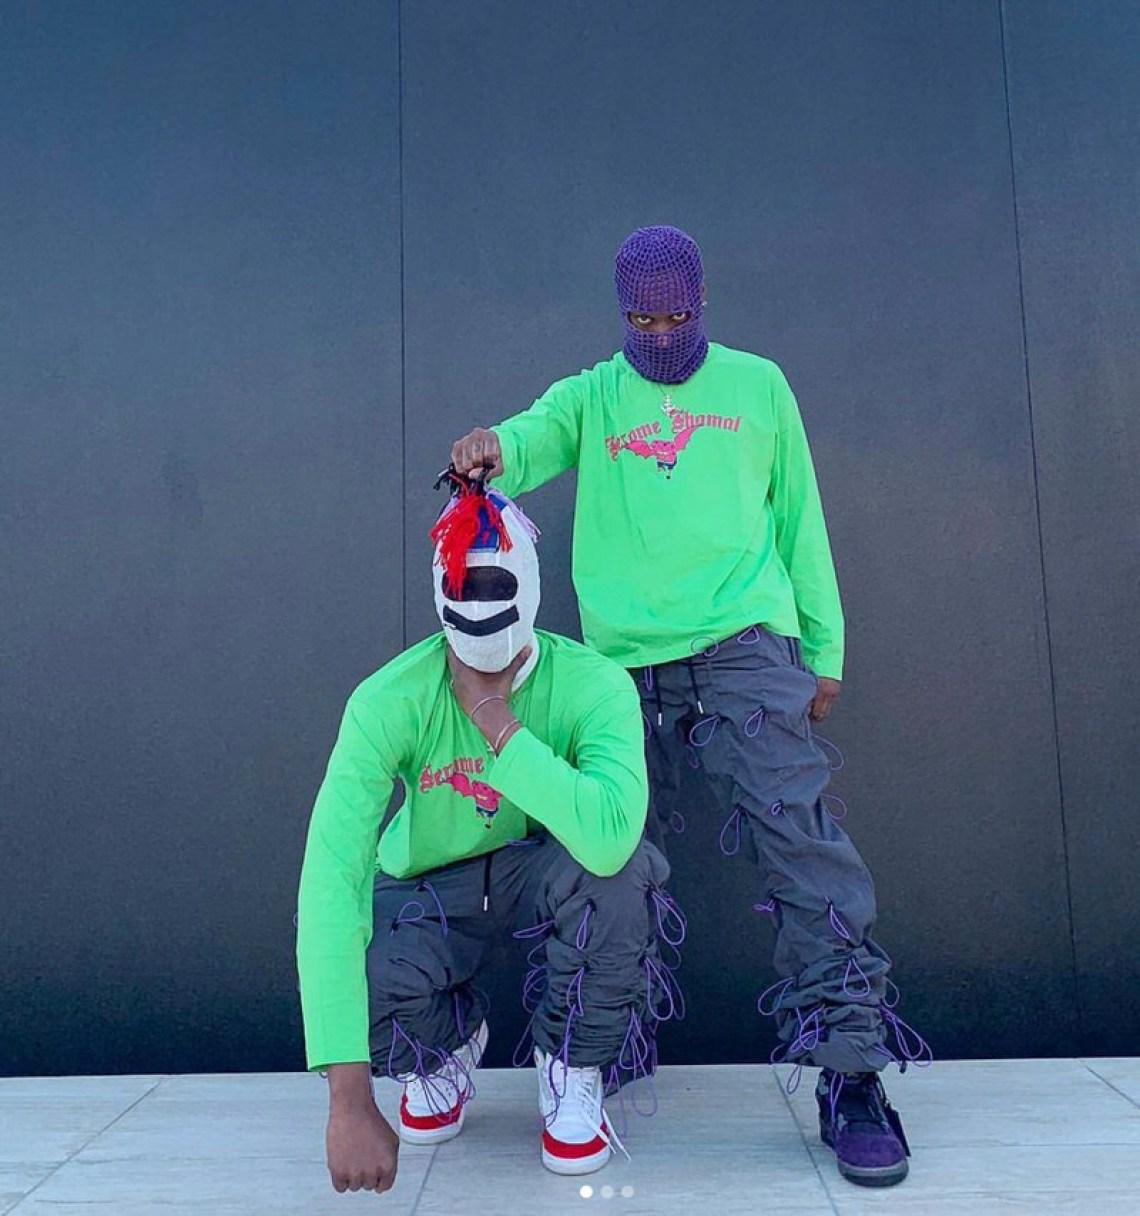 Bloody Osiris in the Travis Scott x Air Jordan 4